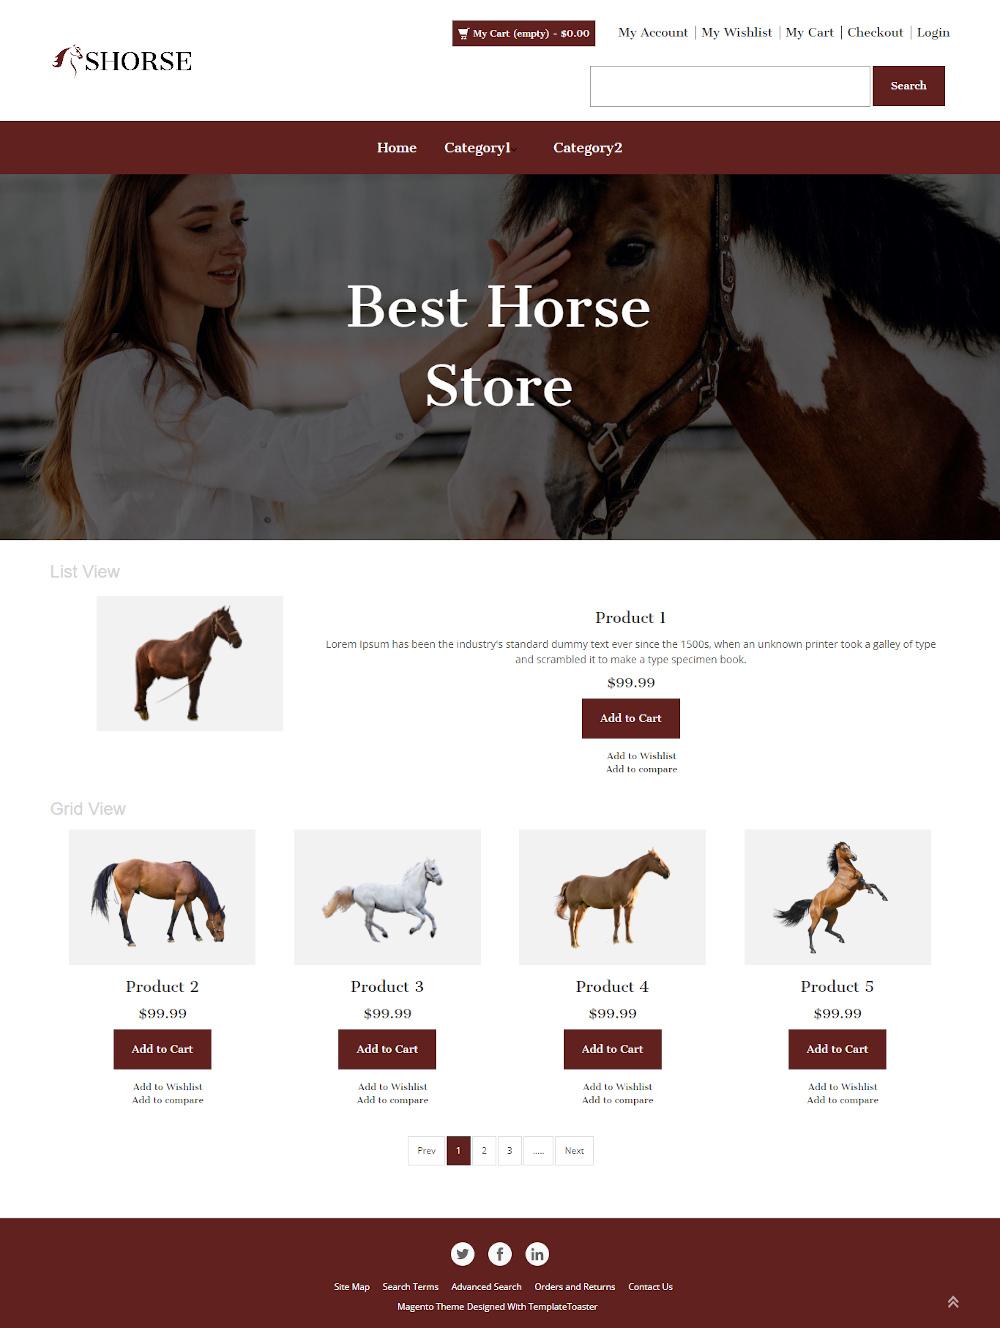 Shorse - Online Horse Store Magento Theme